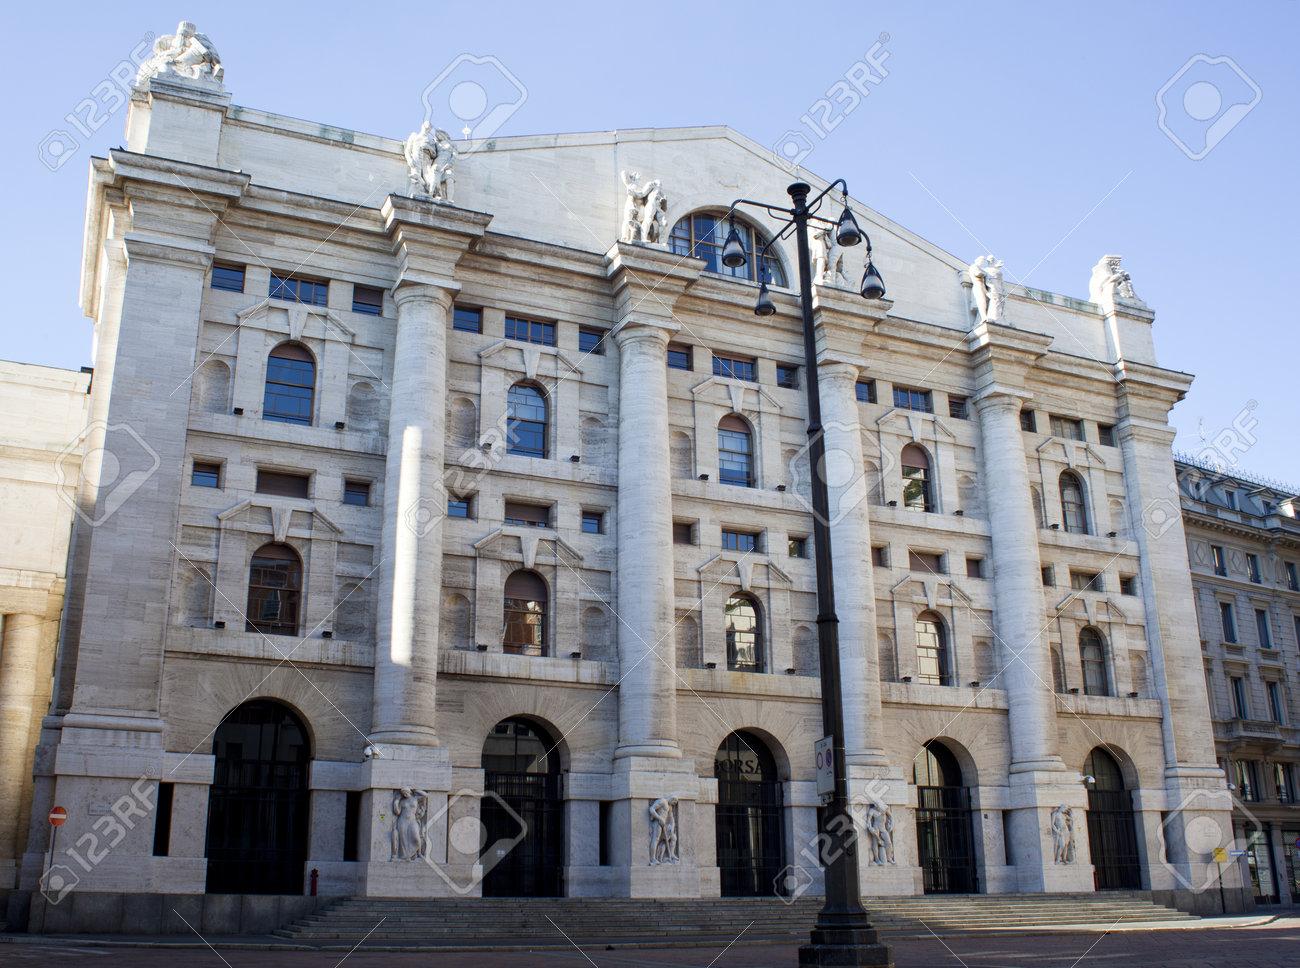 Palazzo della borsa. Exchange building, Milano  Stock Photo - 10004404